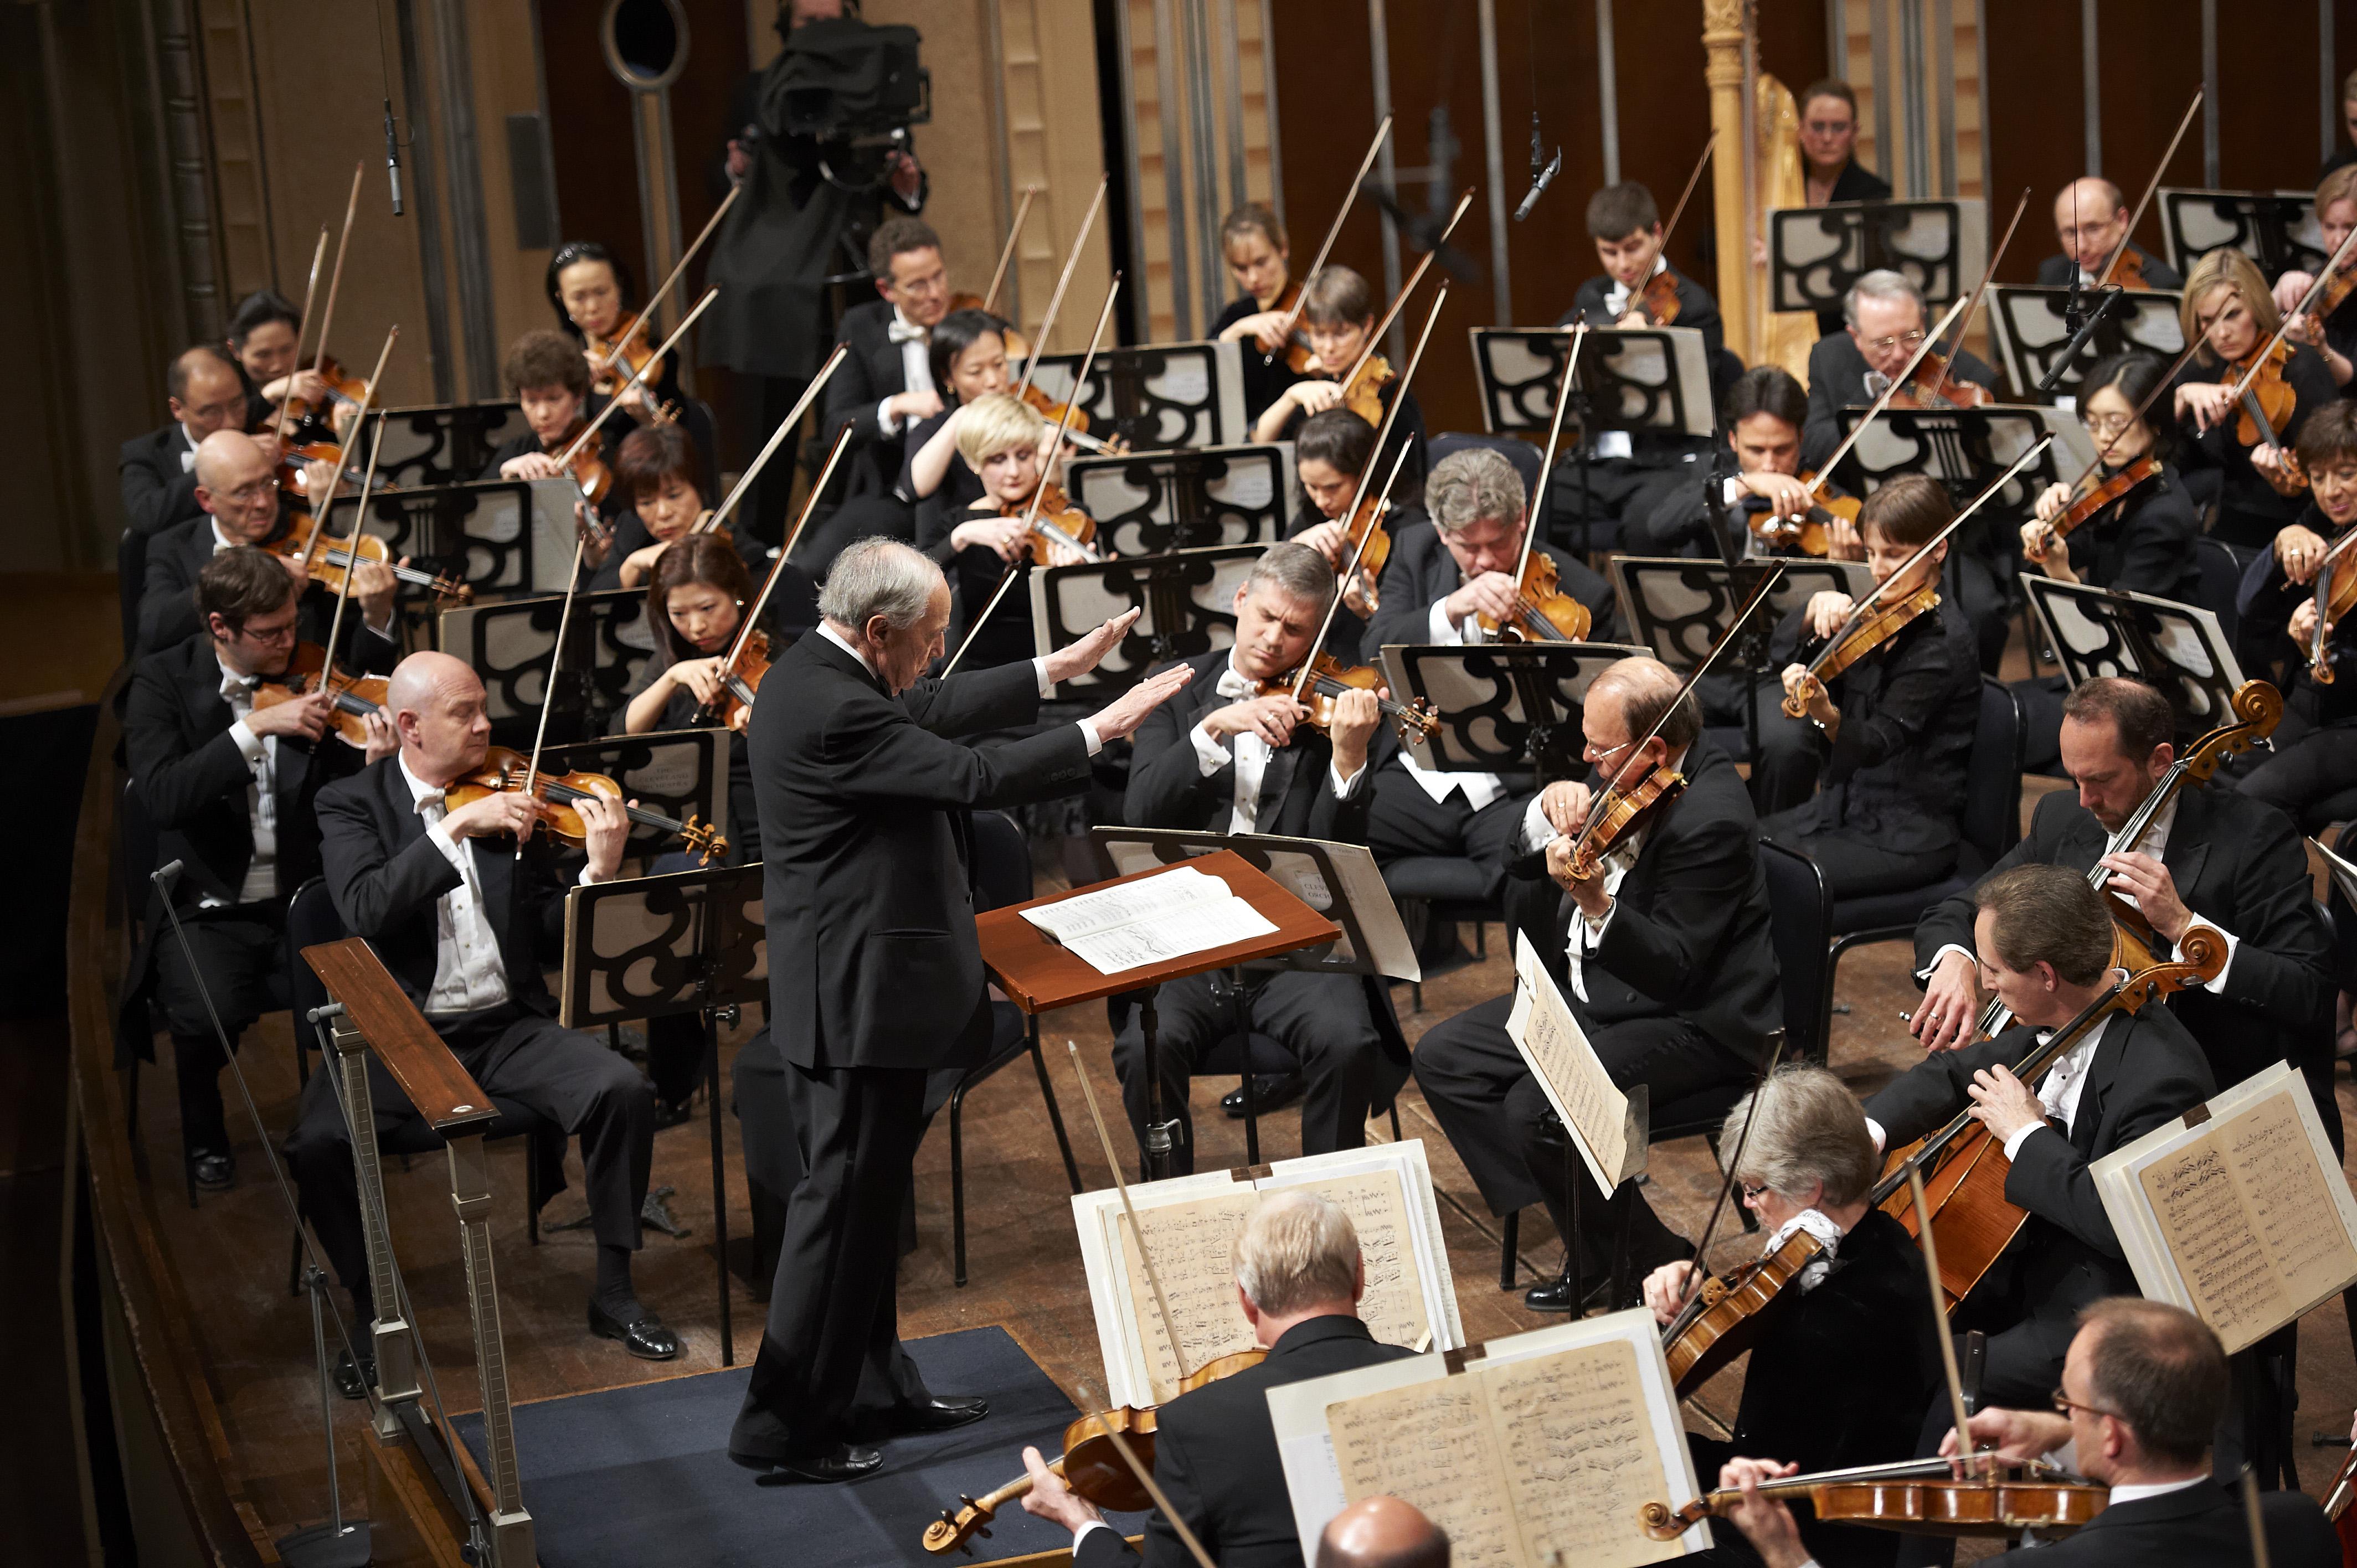 Hear Gustav Mahler S Adagio On Friday July 5th At 9 Pm Kenw